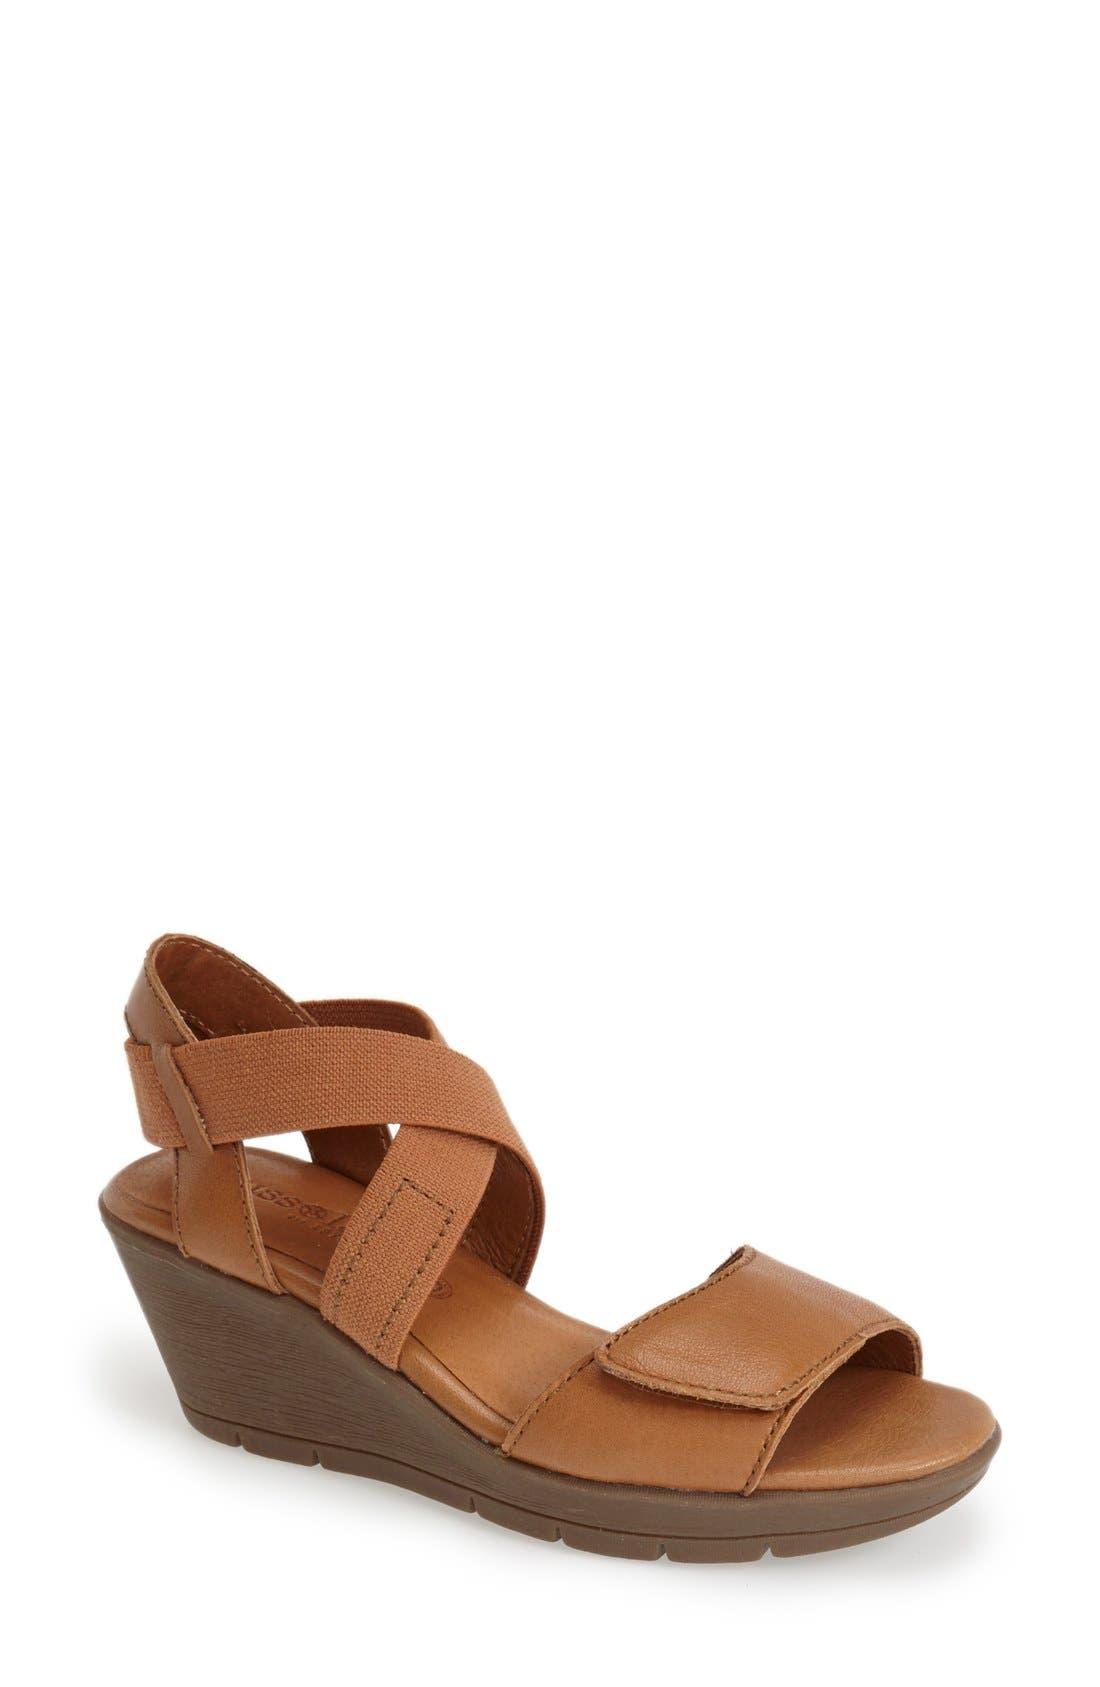 Alternate Image 1 Selected - Bussola 'Zumaia' Wedge Sandal (Women)